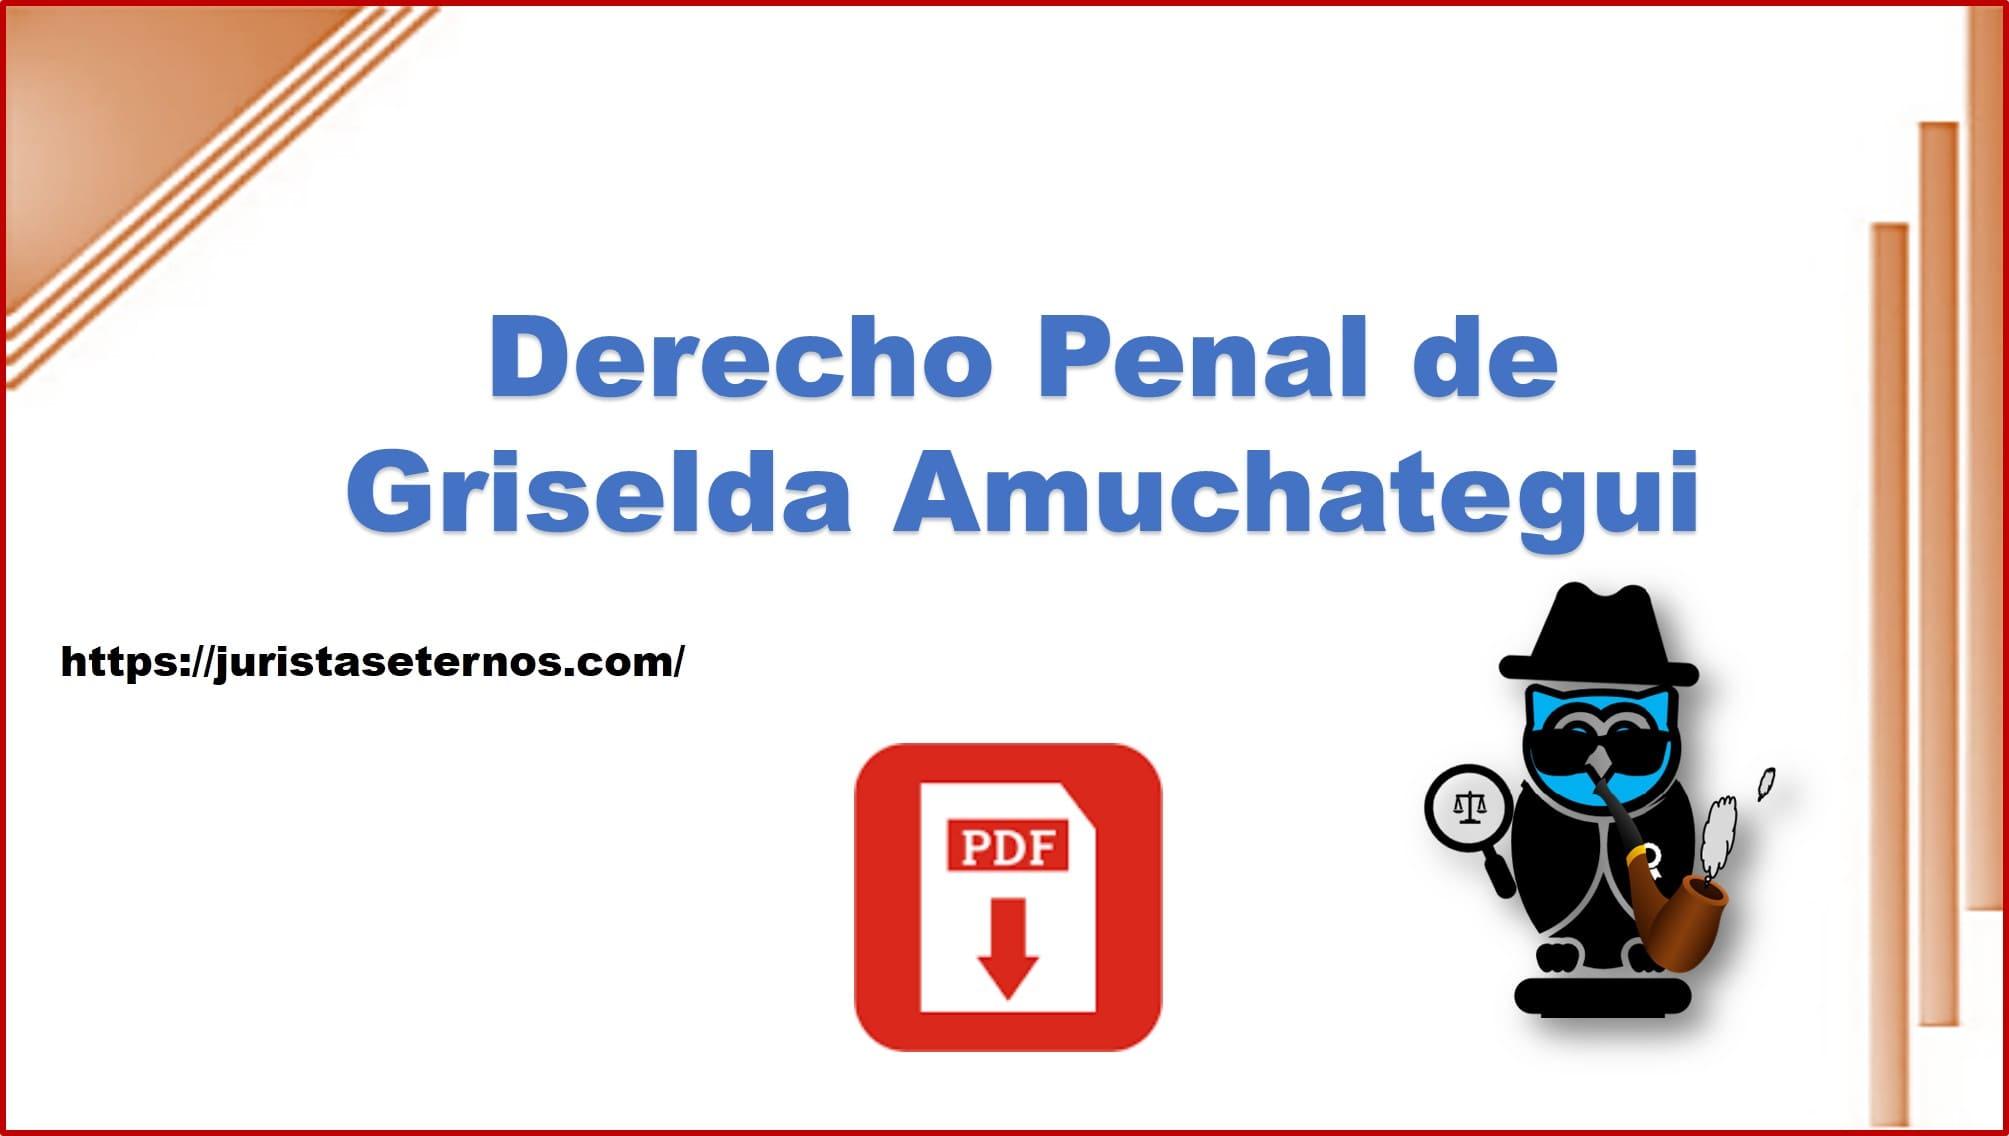 derecho penal griselda amuchategui pdf